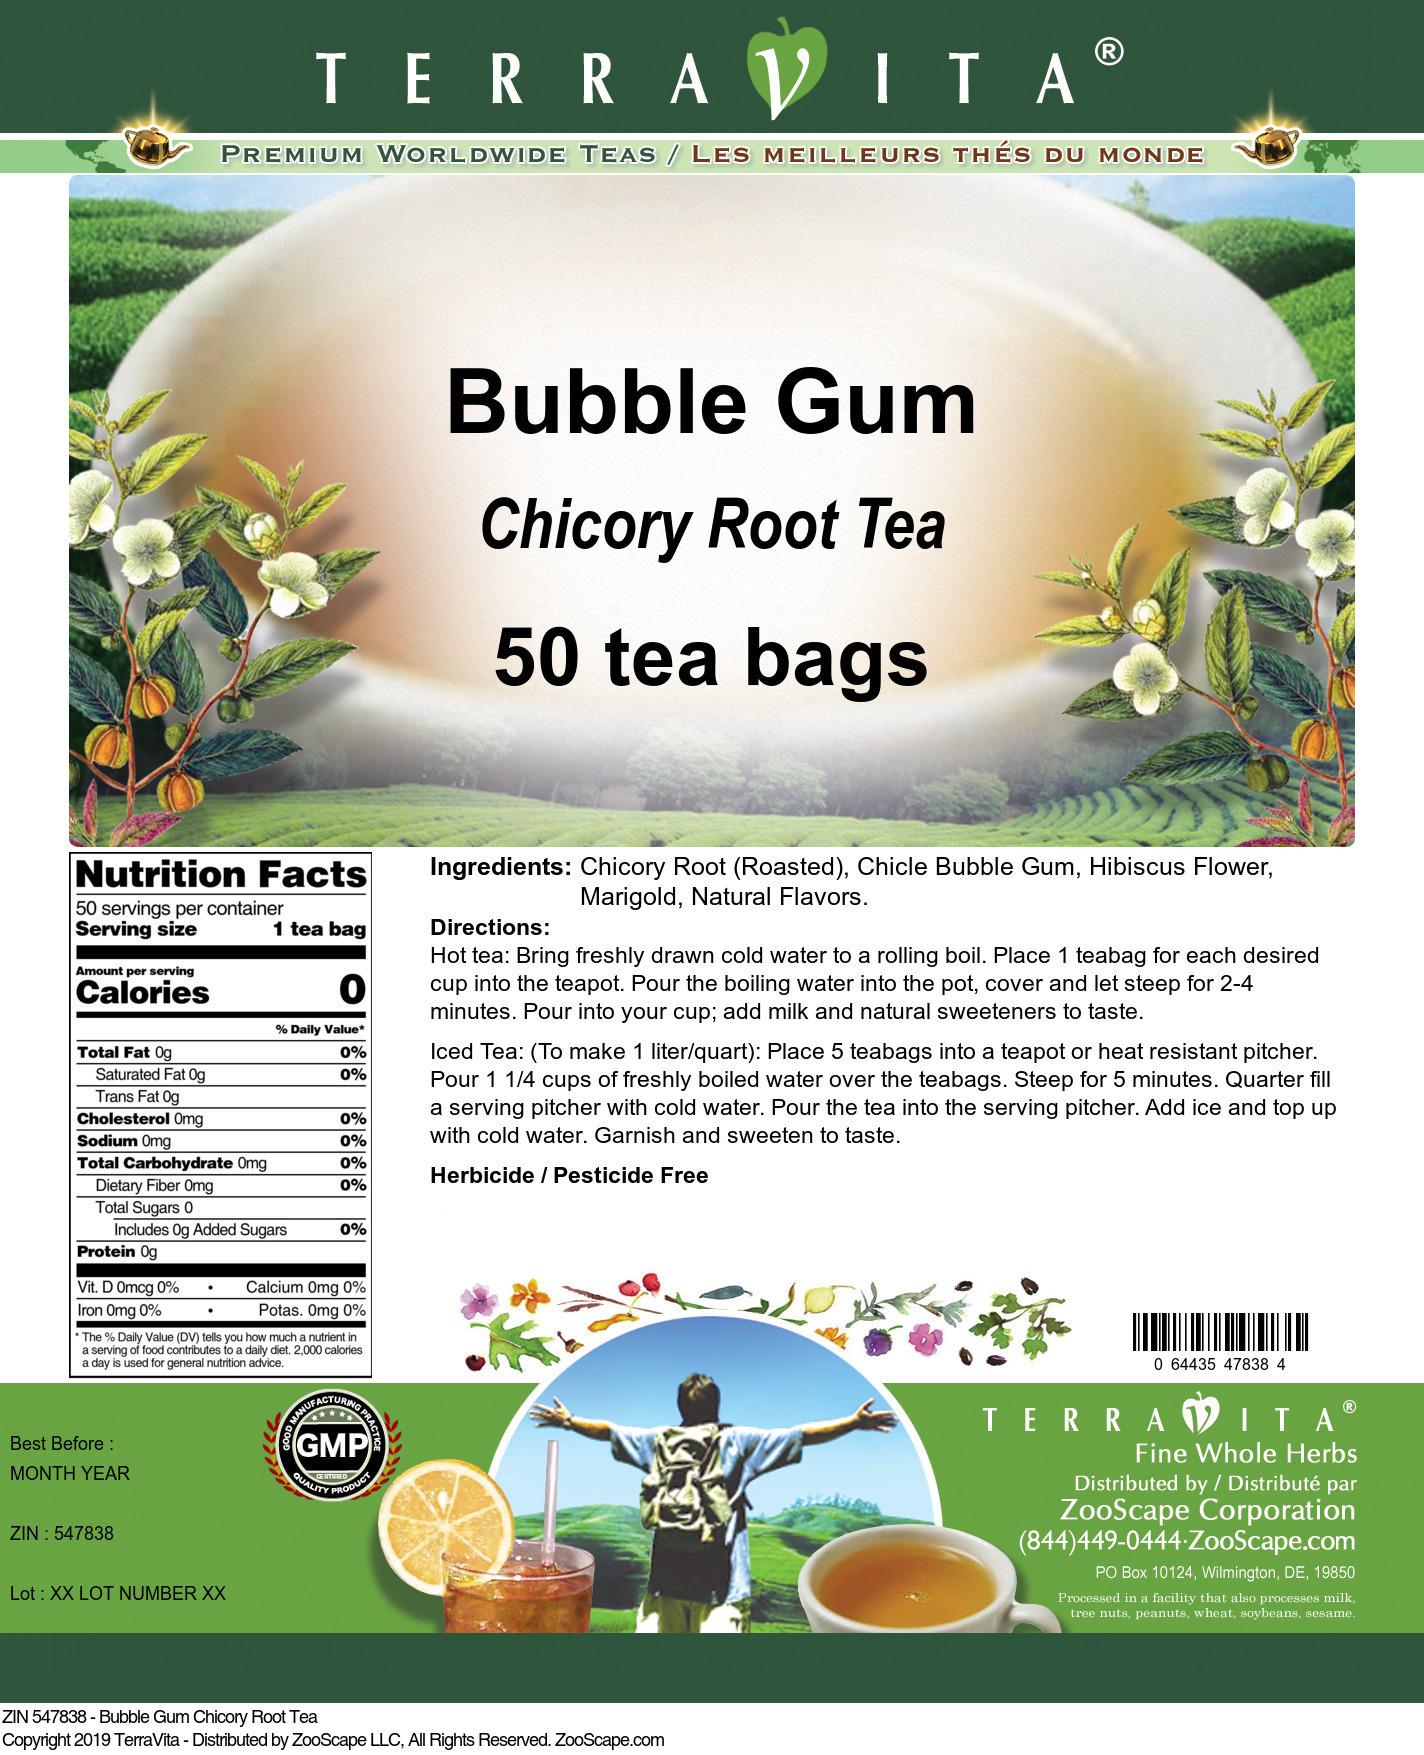 Bubble Gum Chicory Root